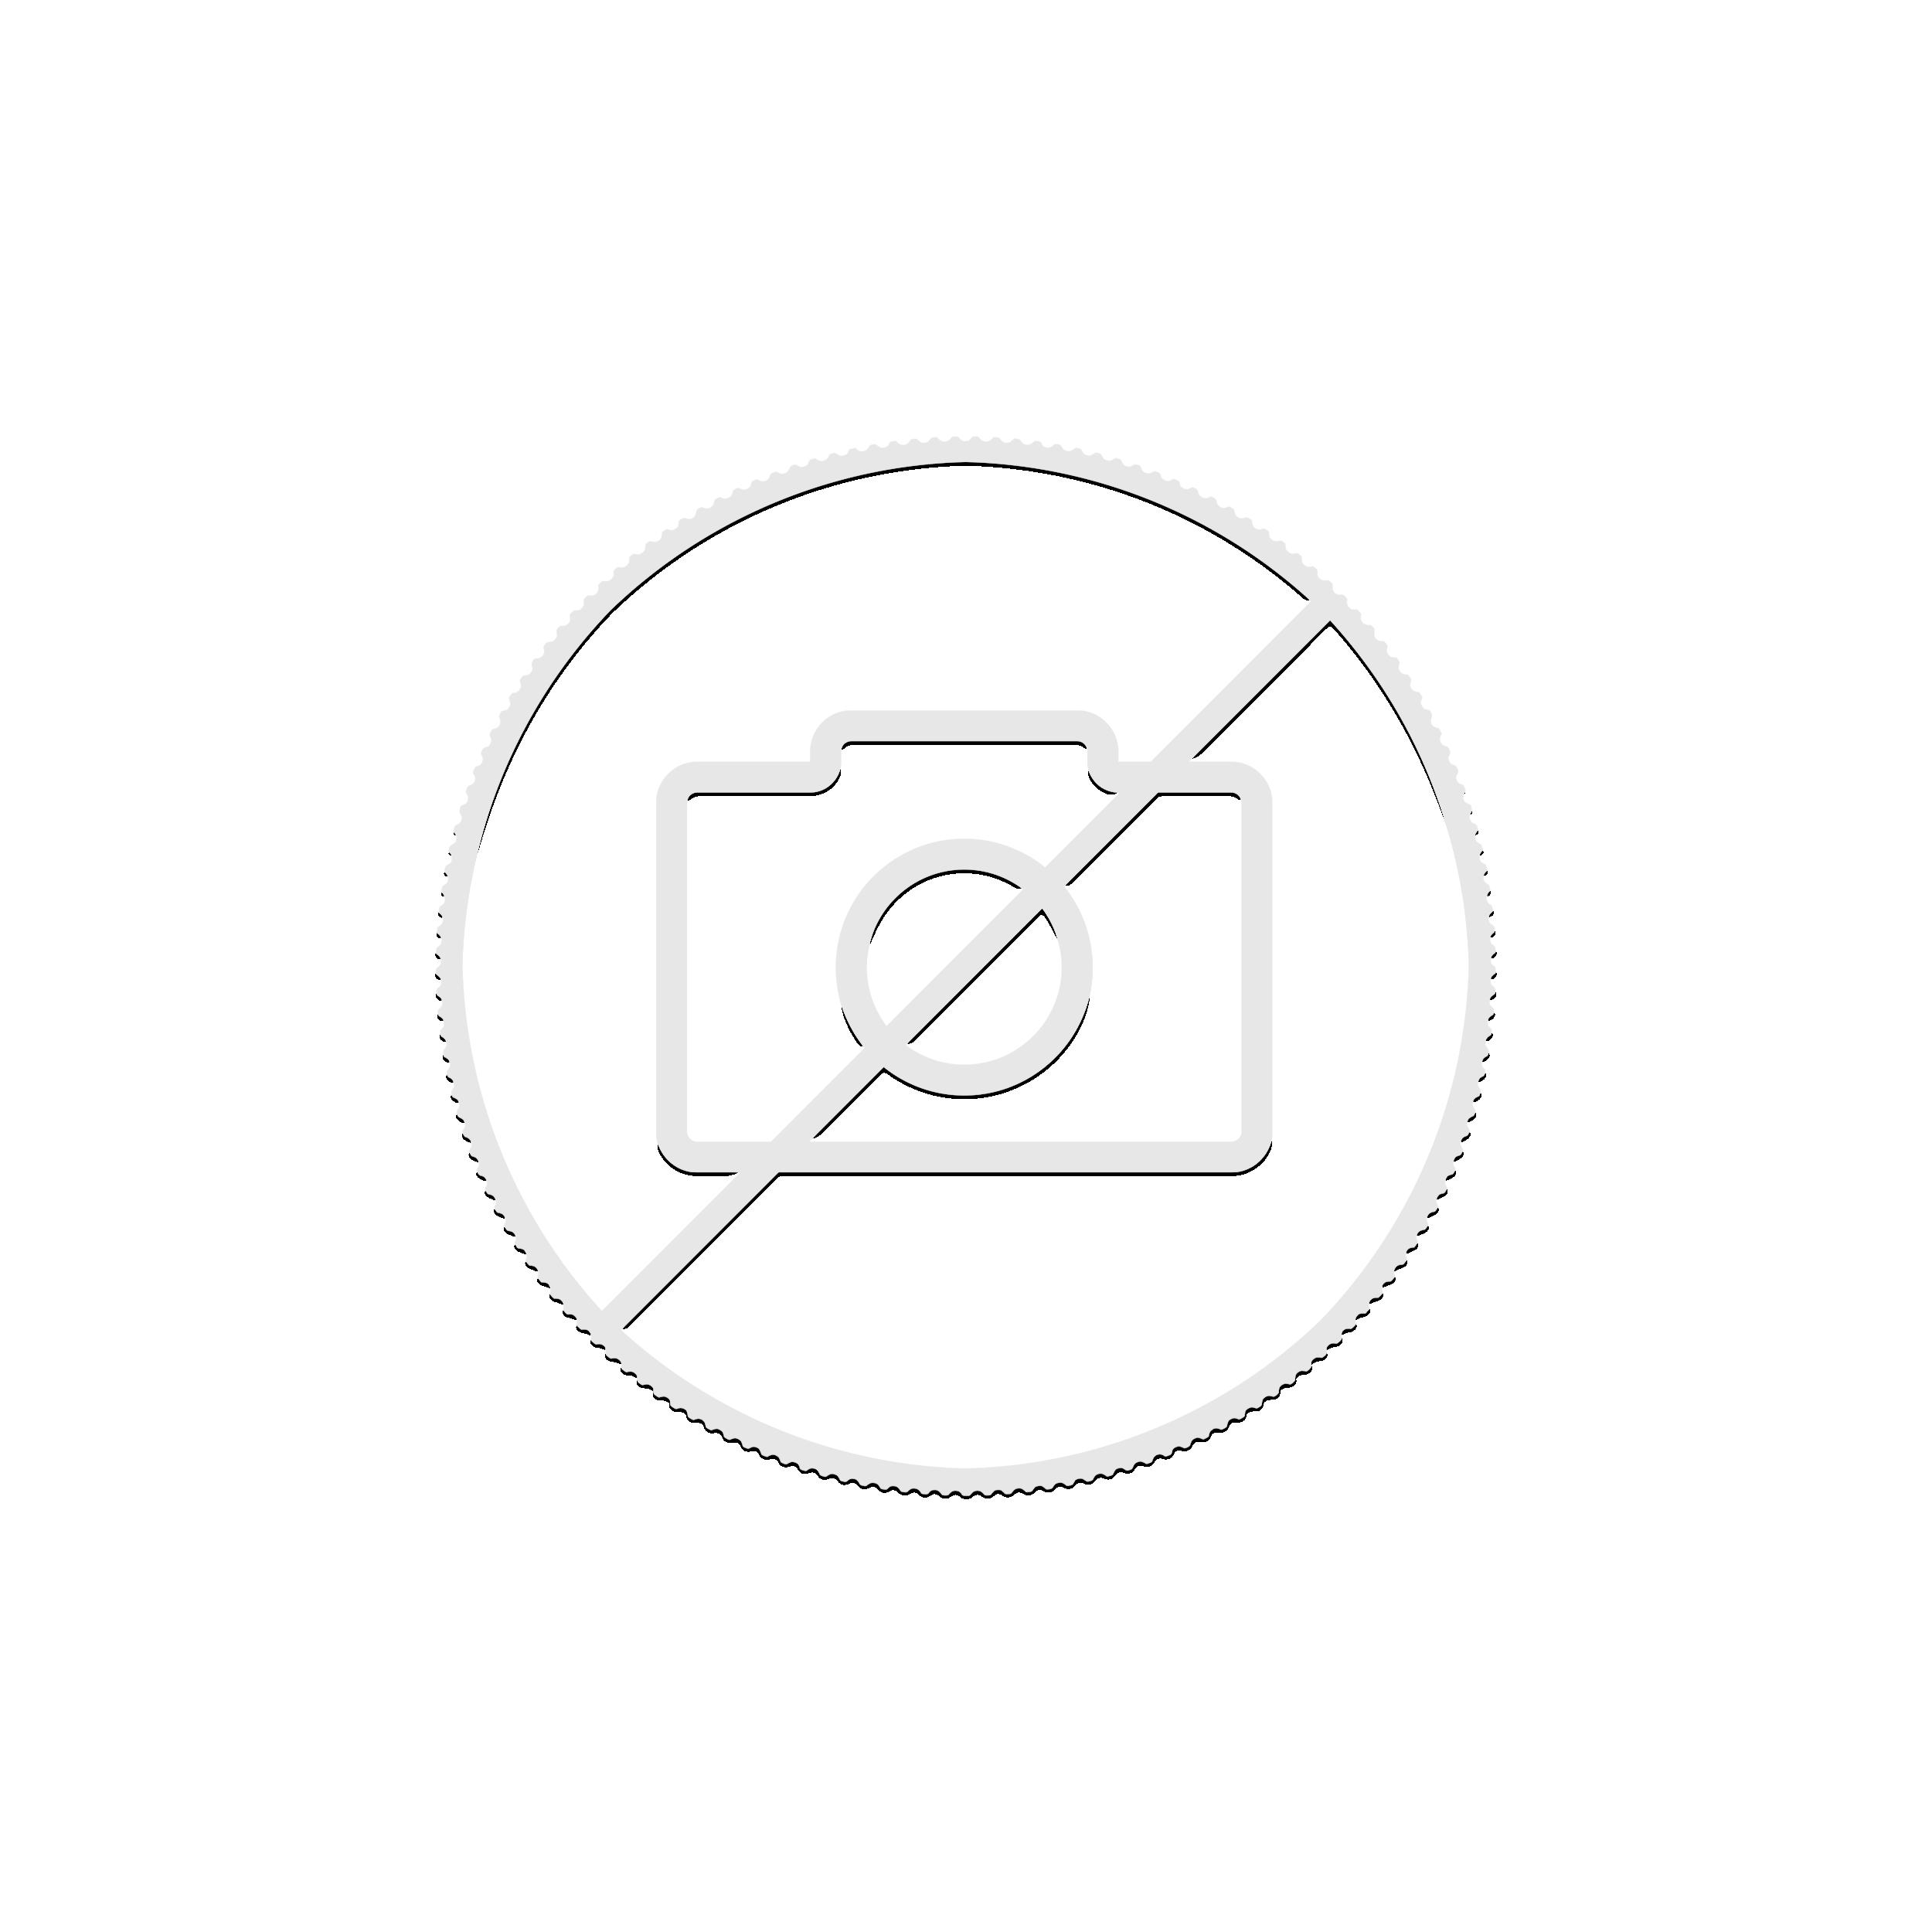 1 troy ounce silver coin Queen Elizabeth II 95th birthday 2021 proof